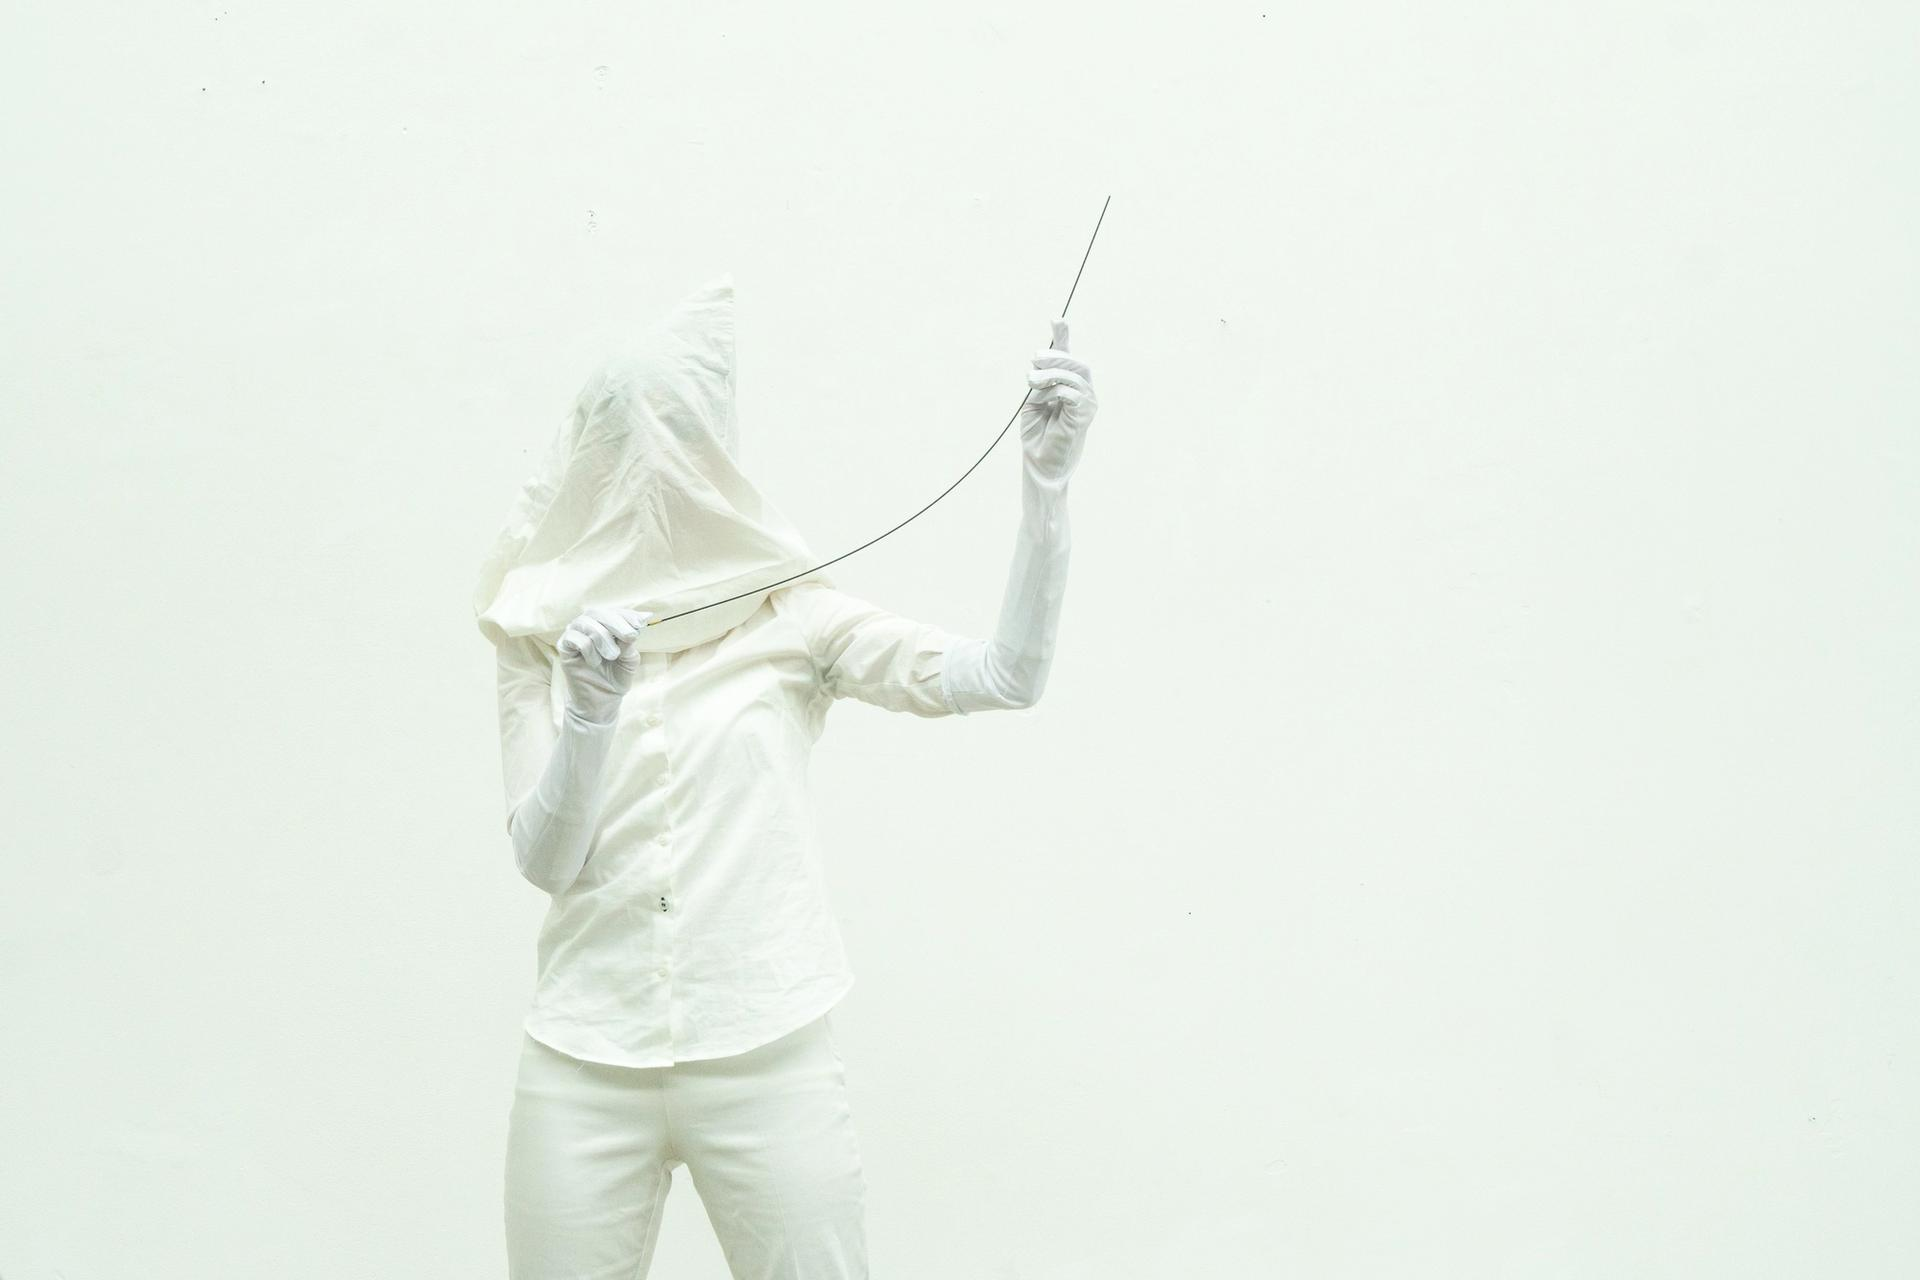 Kensho Miyoshi - Kinaesthetics, White puppeteer